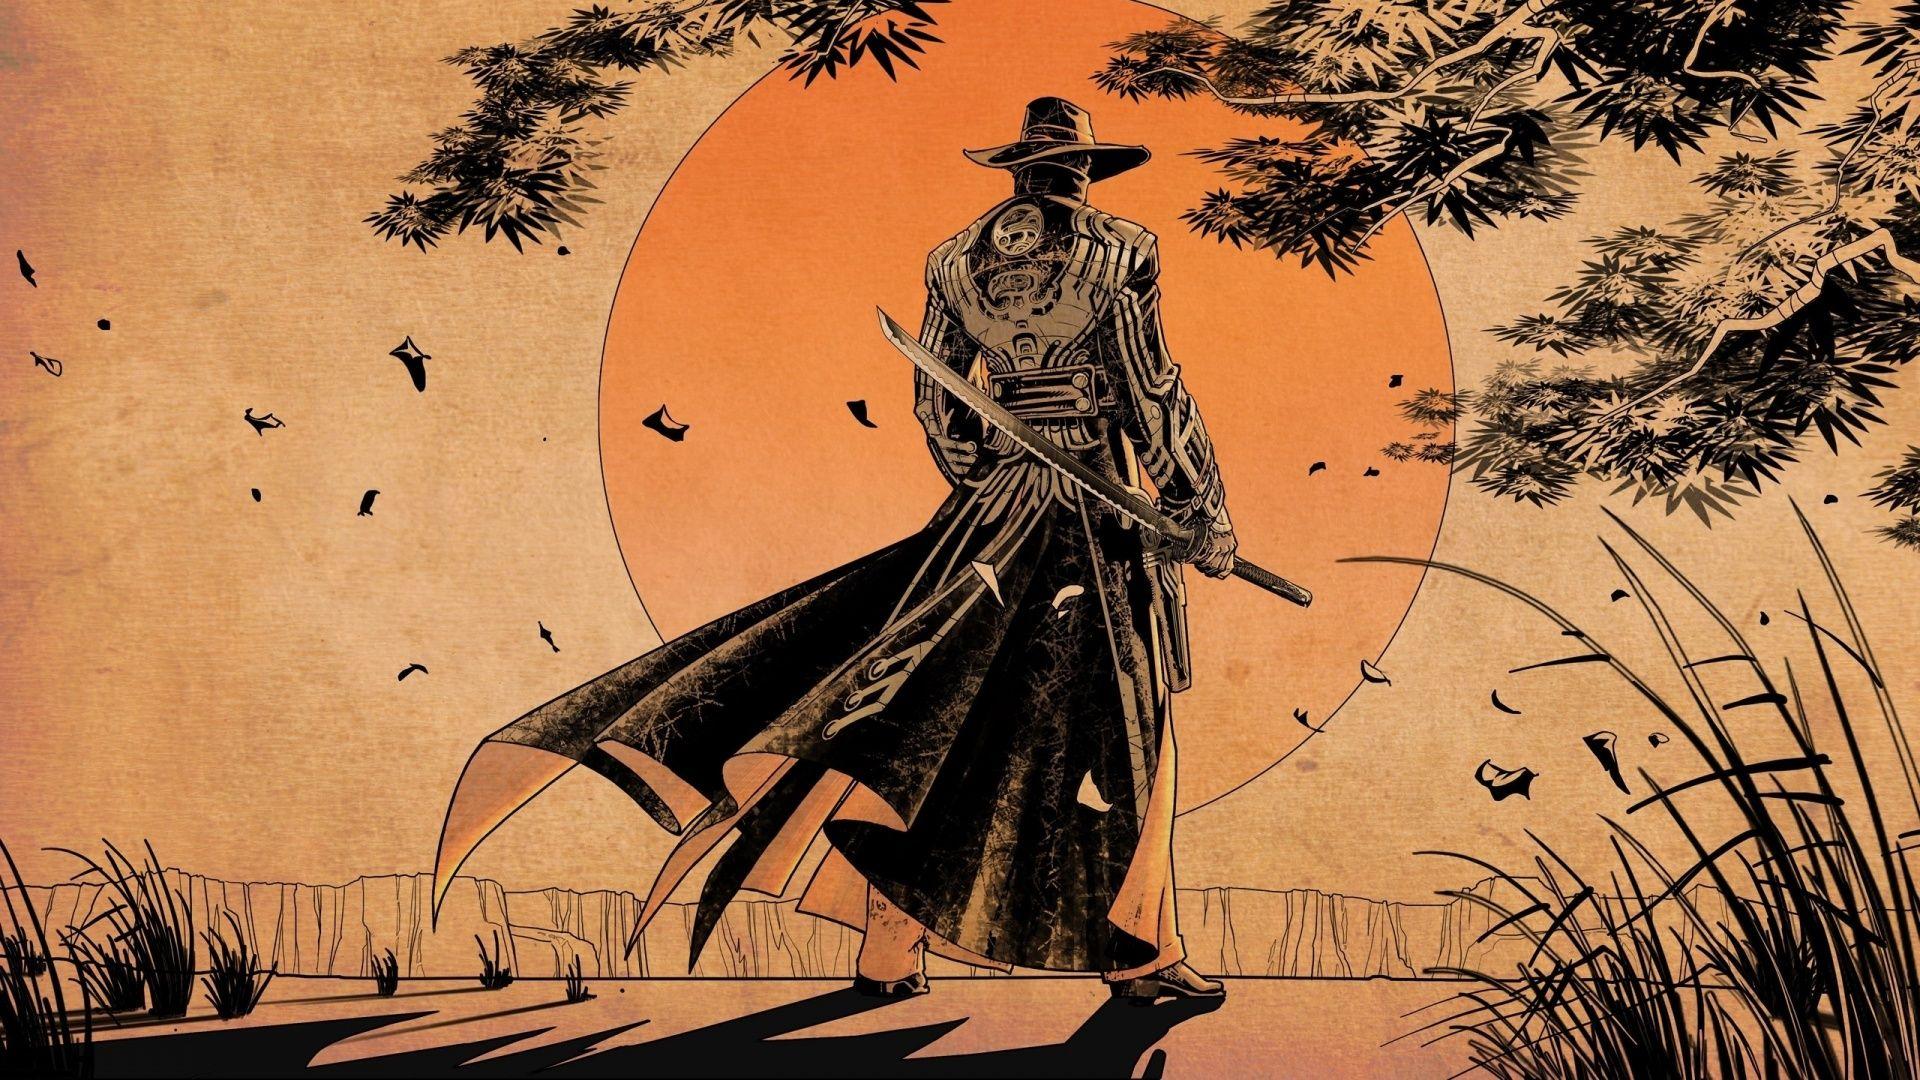 samurai art wallpaper hd Anime Pinterest Colors